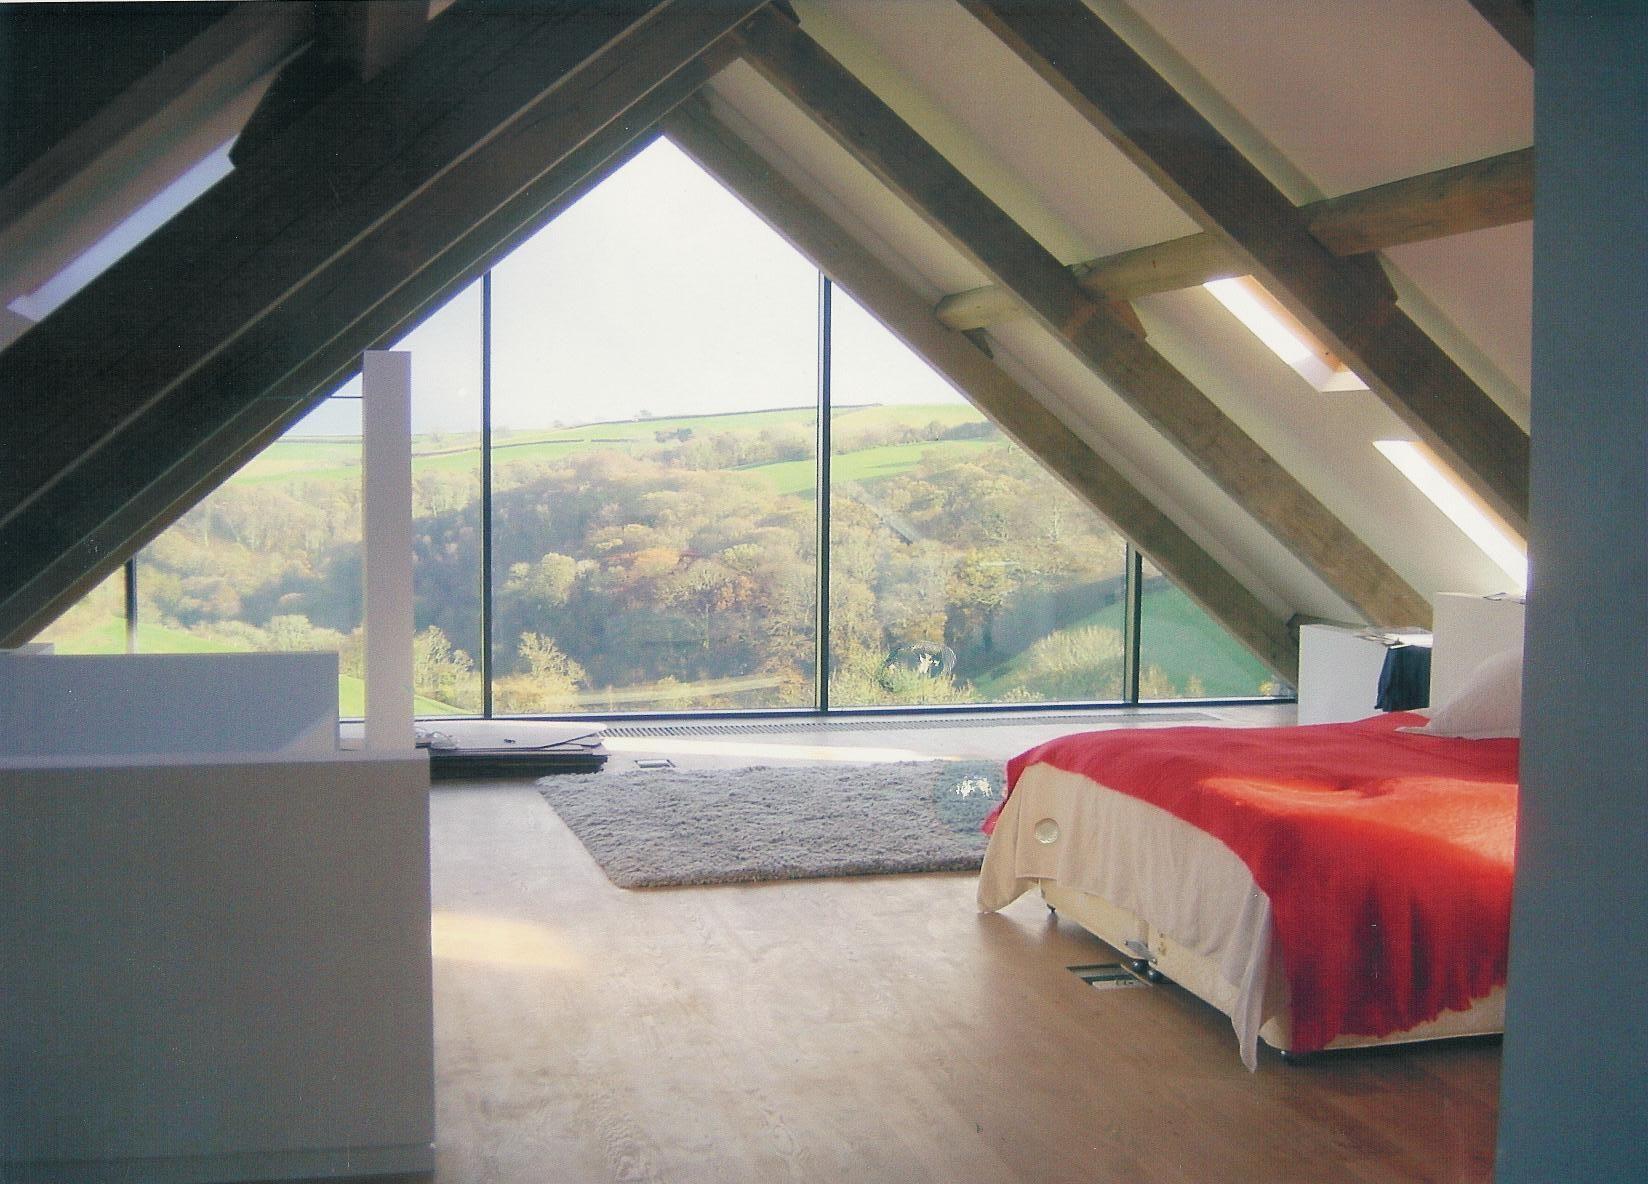 Honeymoon Bedroom Ideas With Large Glass Window And Doors